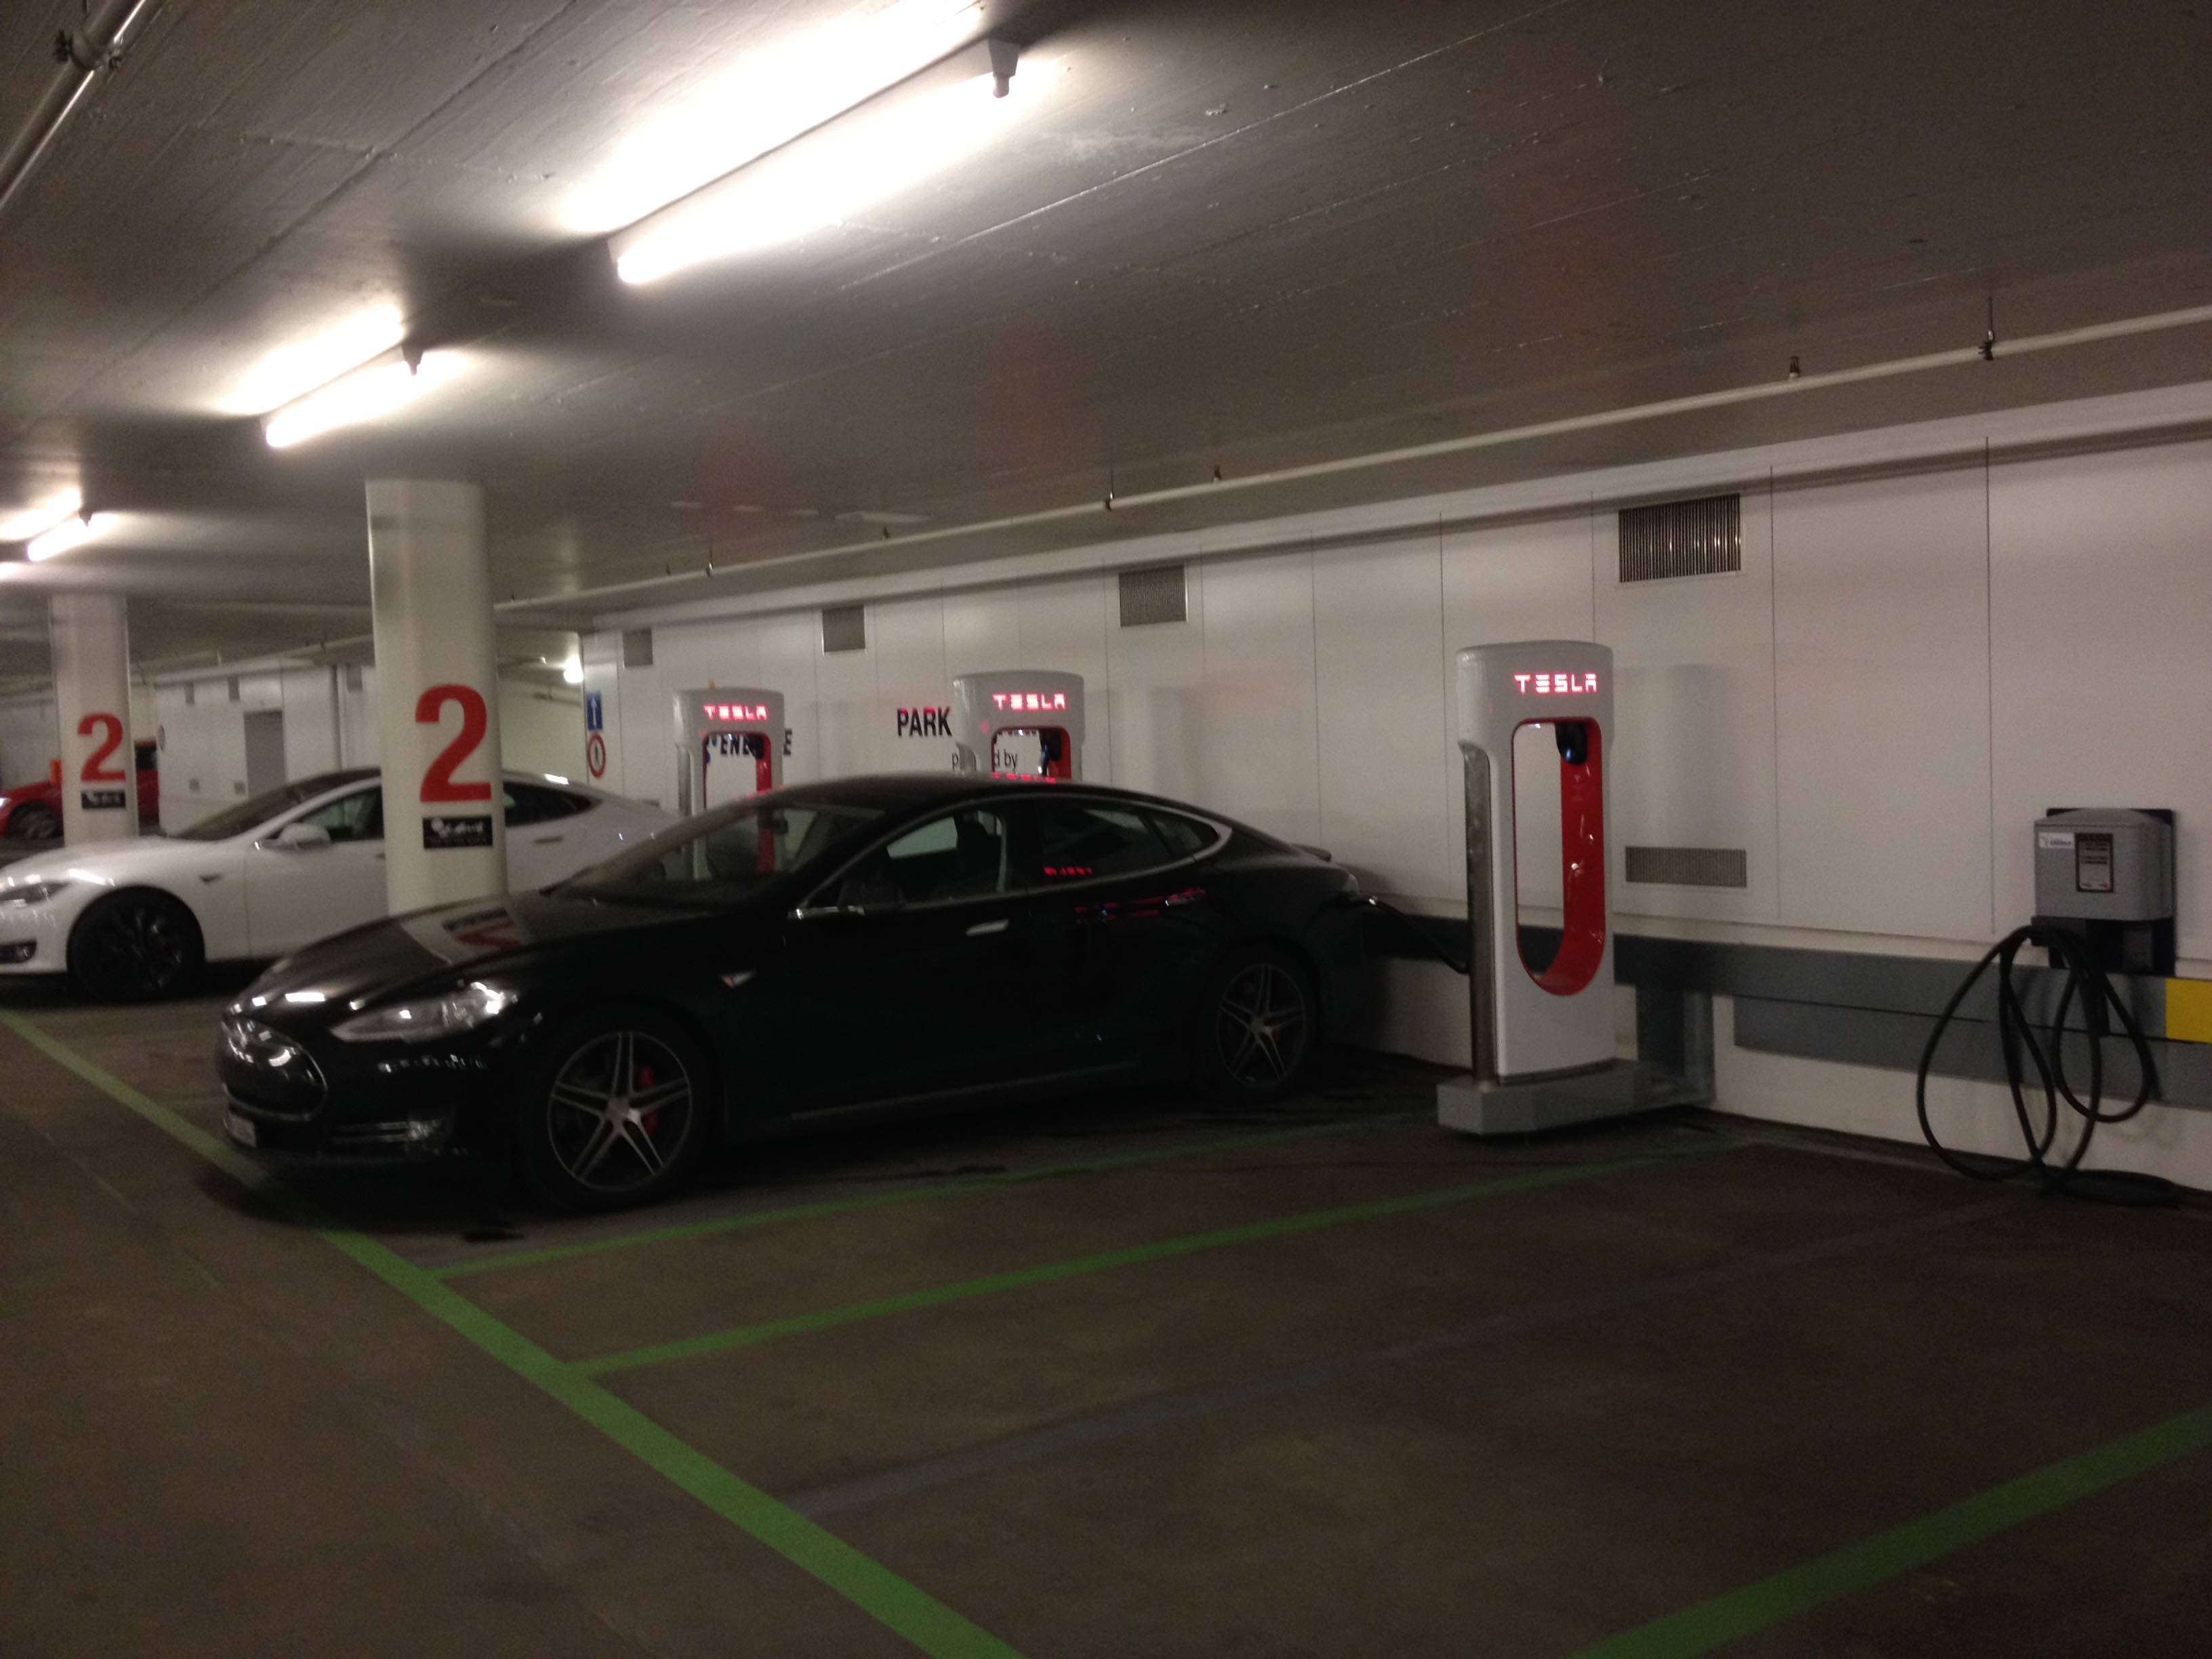 thismac-supercharger-st.moritz-1